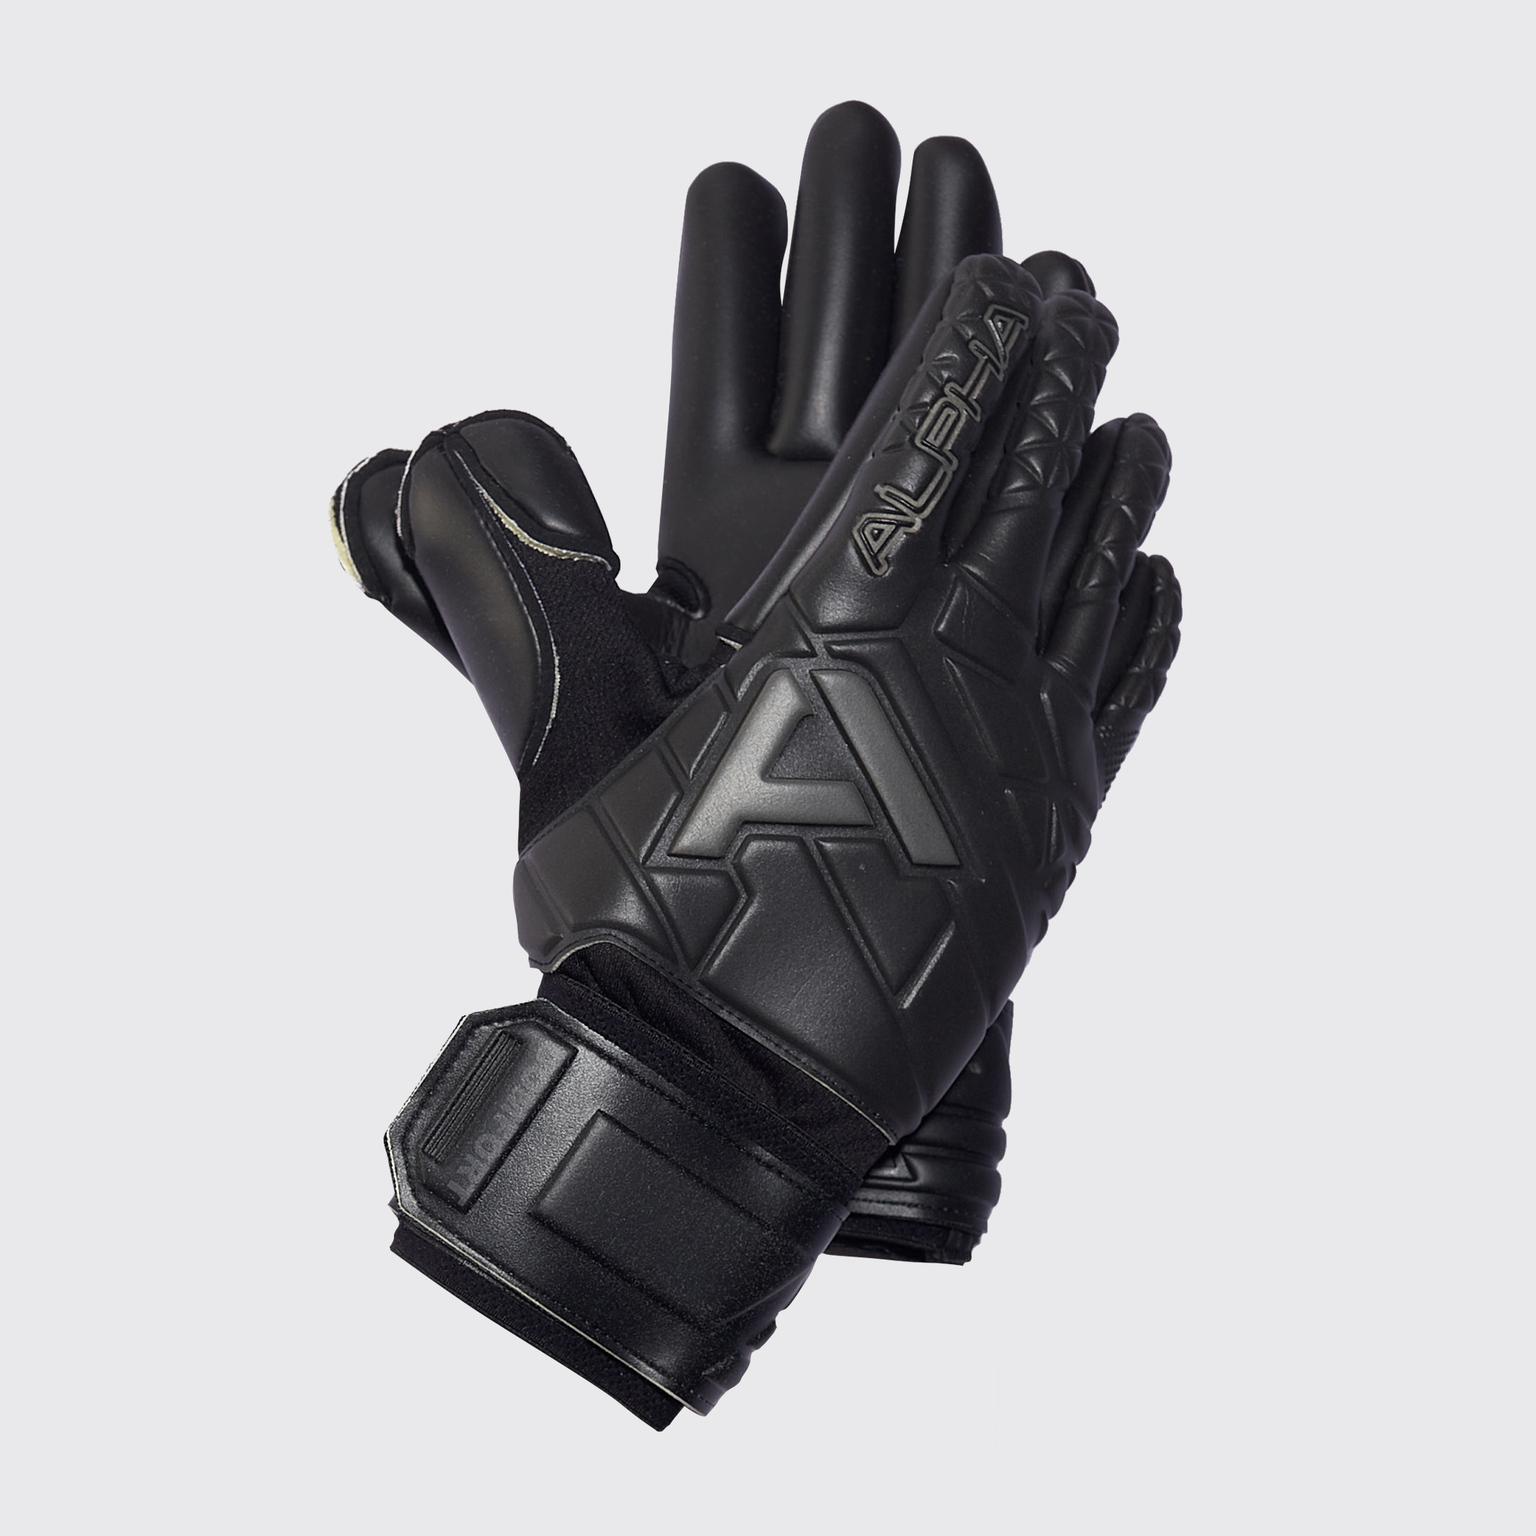 Перчатки вратарские AlphaKeepers Maestro black 1731-010